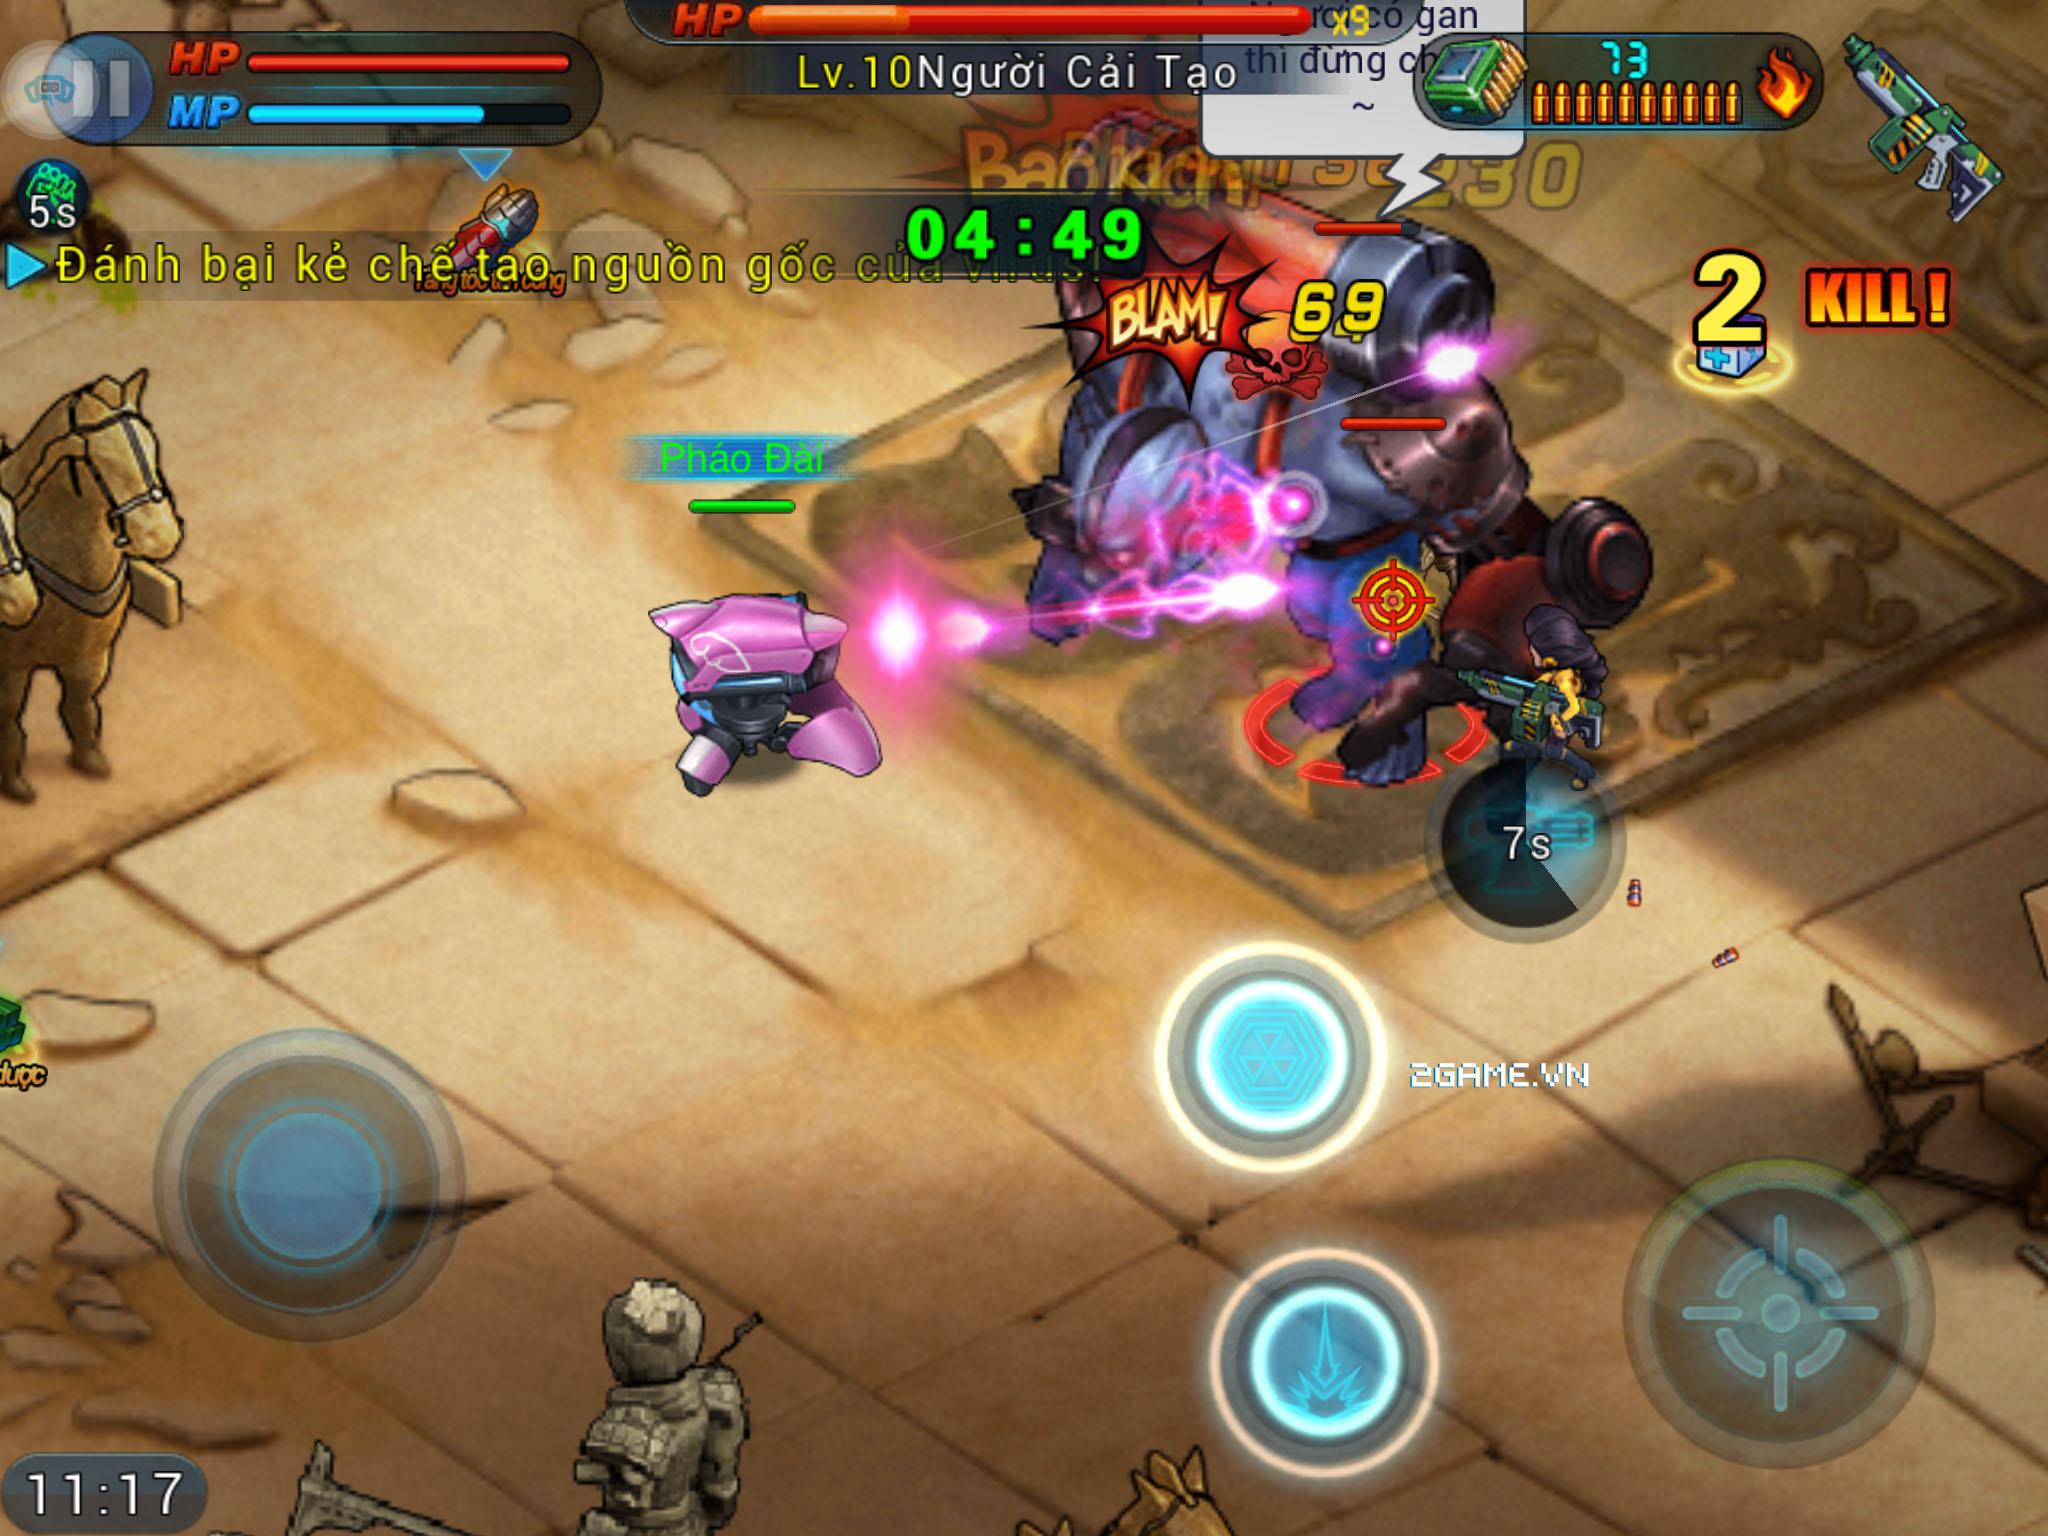 2game_trai_nghiem_avengers_huyen_thoai_vh_3.jpg (2048×1536)